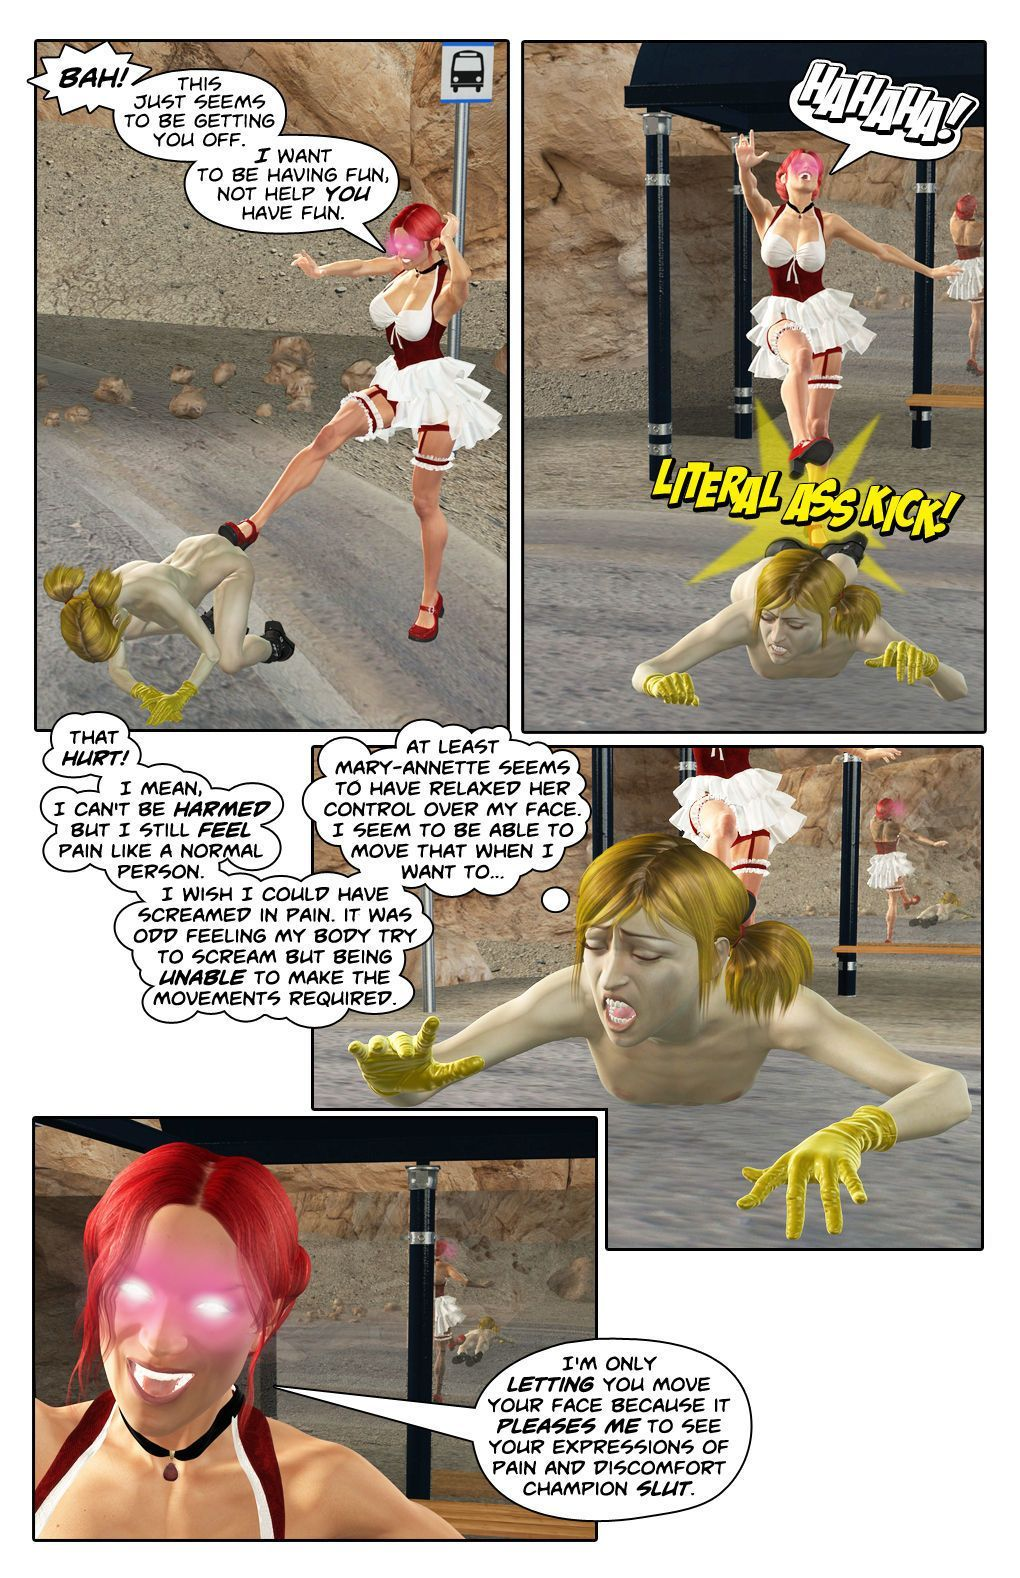 Champion Girl Vs Mary-Annette (A Heroines Perilous World Comc)